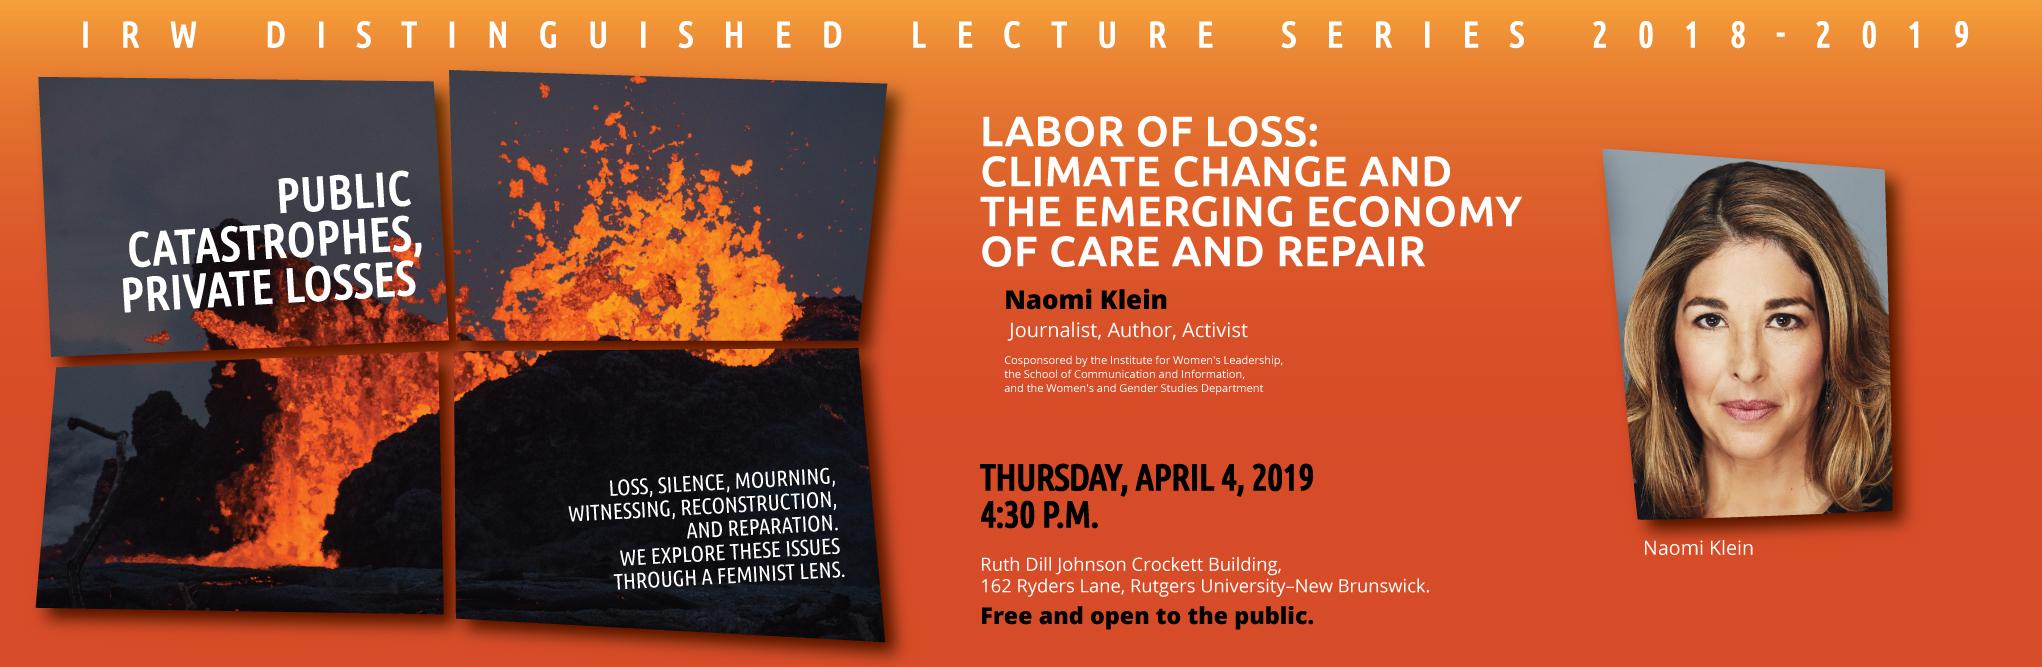 Naomi Klein IRW Distinguished Lecture